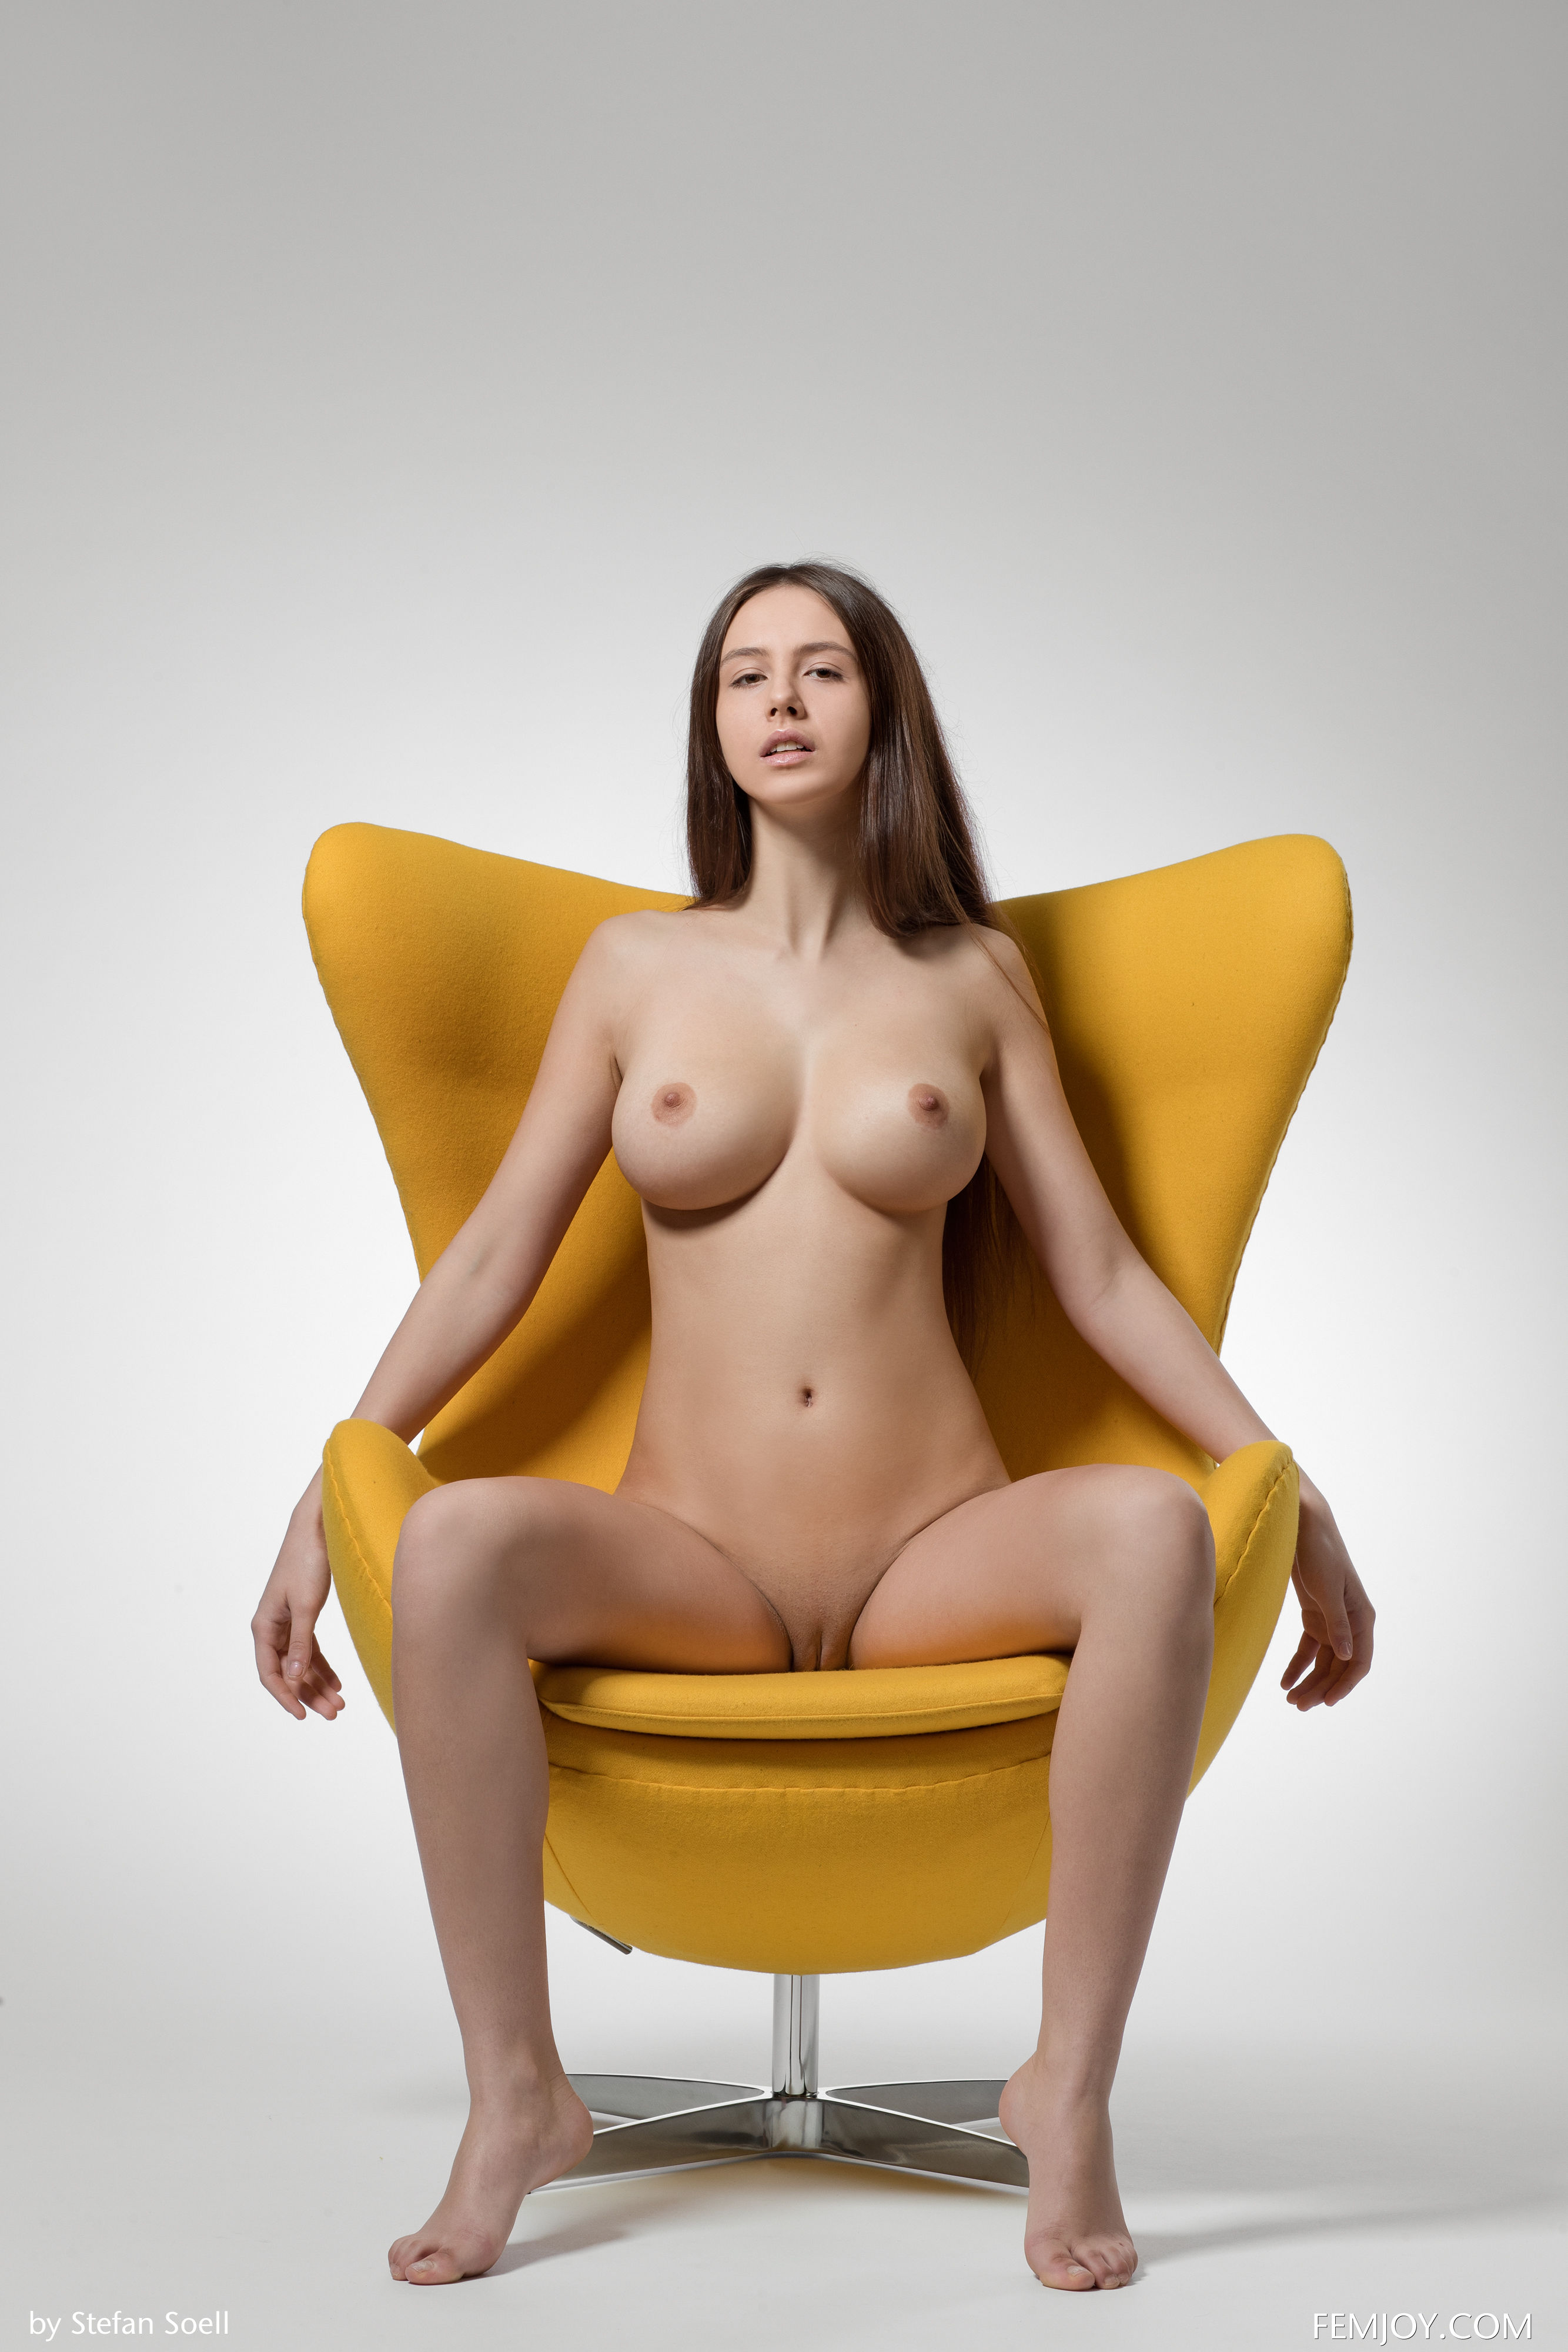 76857624_alisai_femjoy_stefansoell_yellow_19052018p_05.jpg